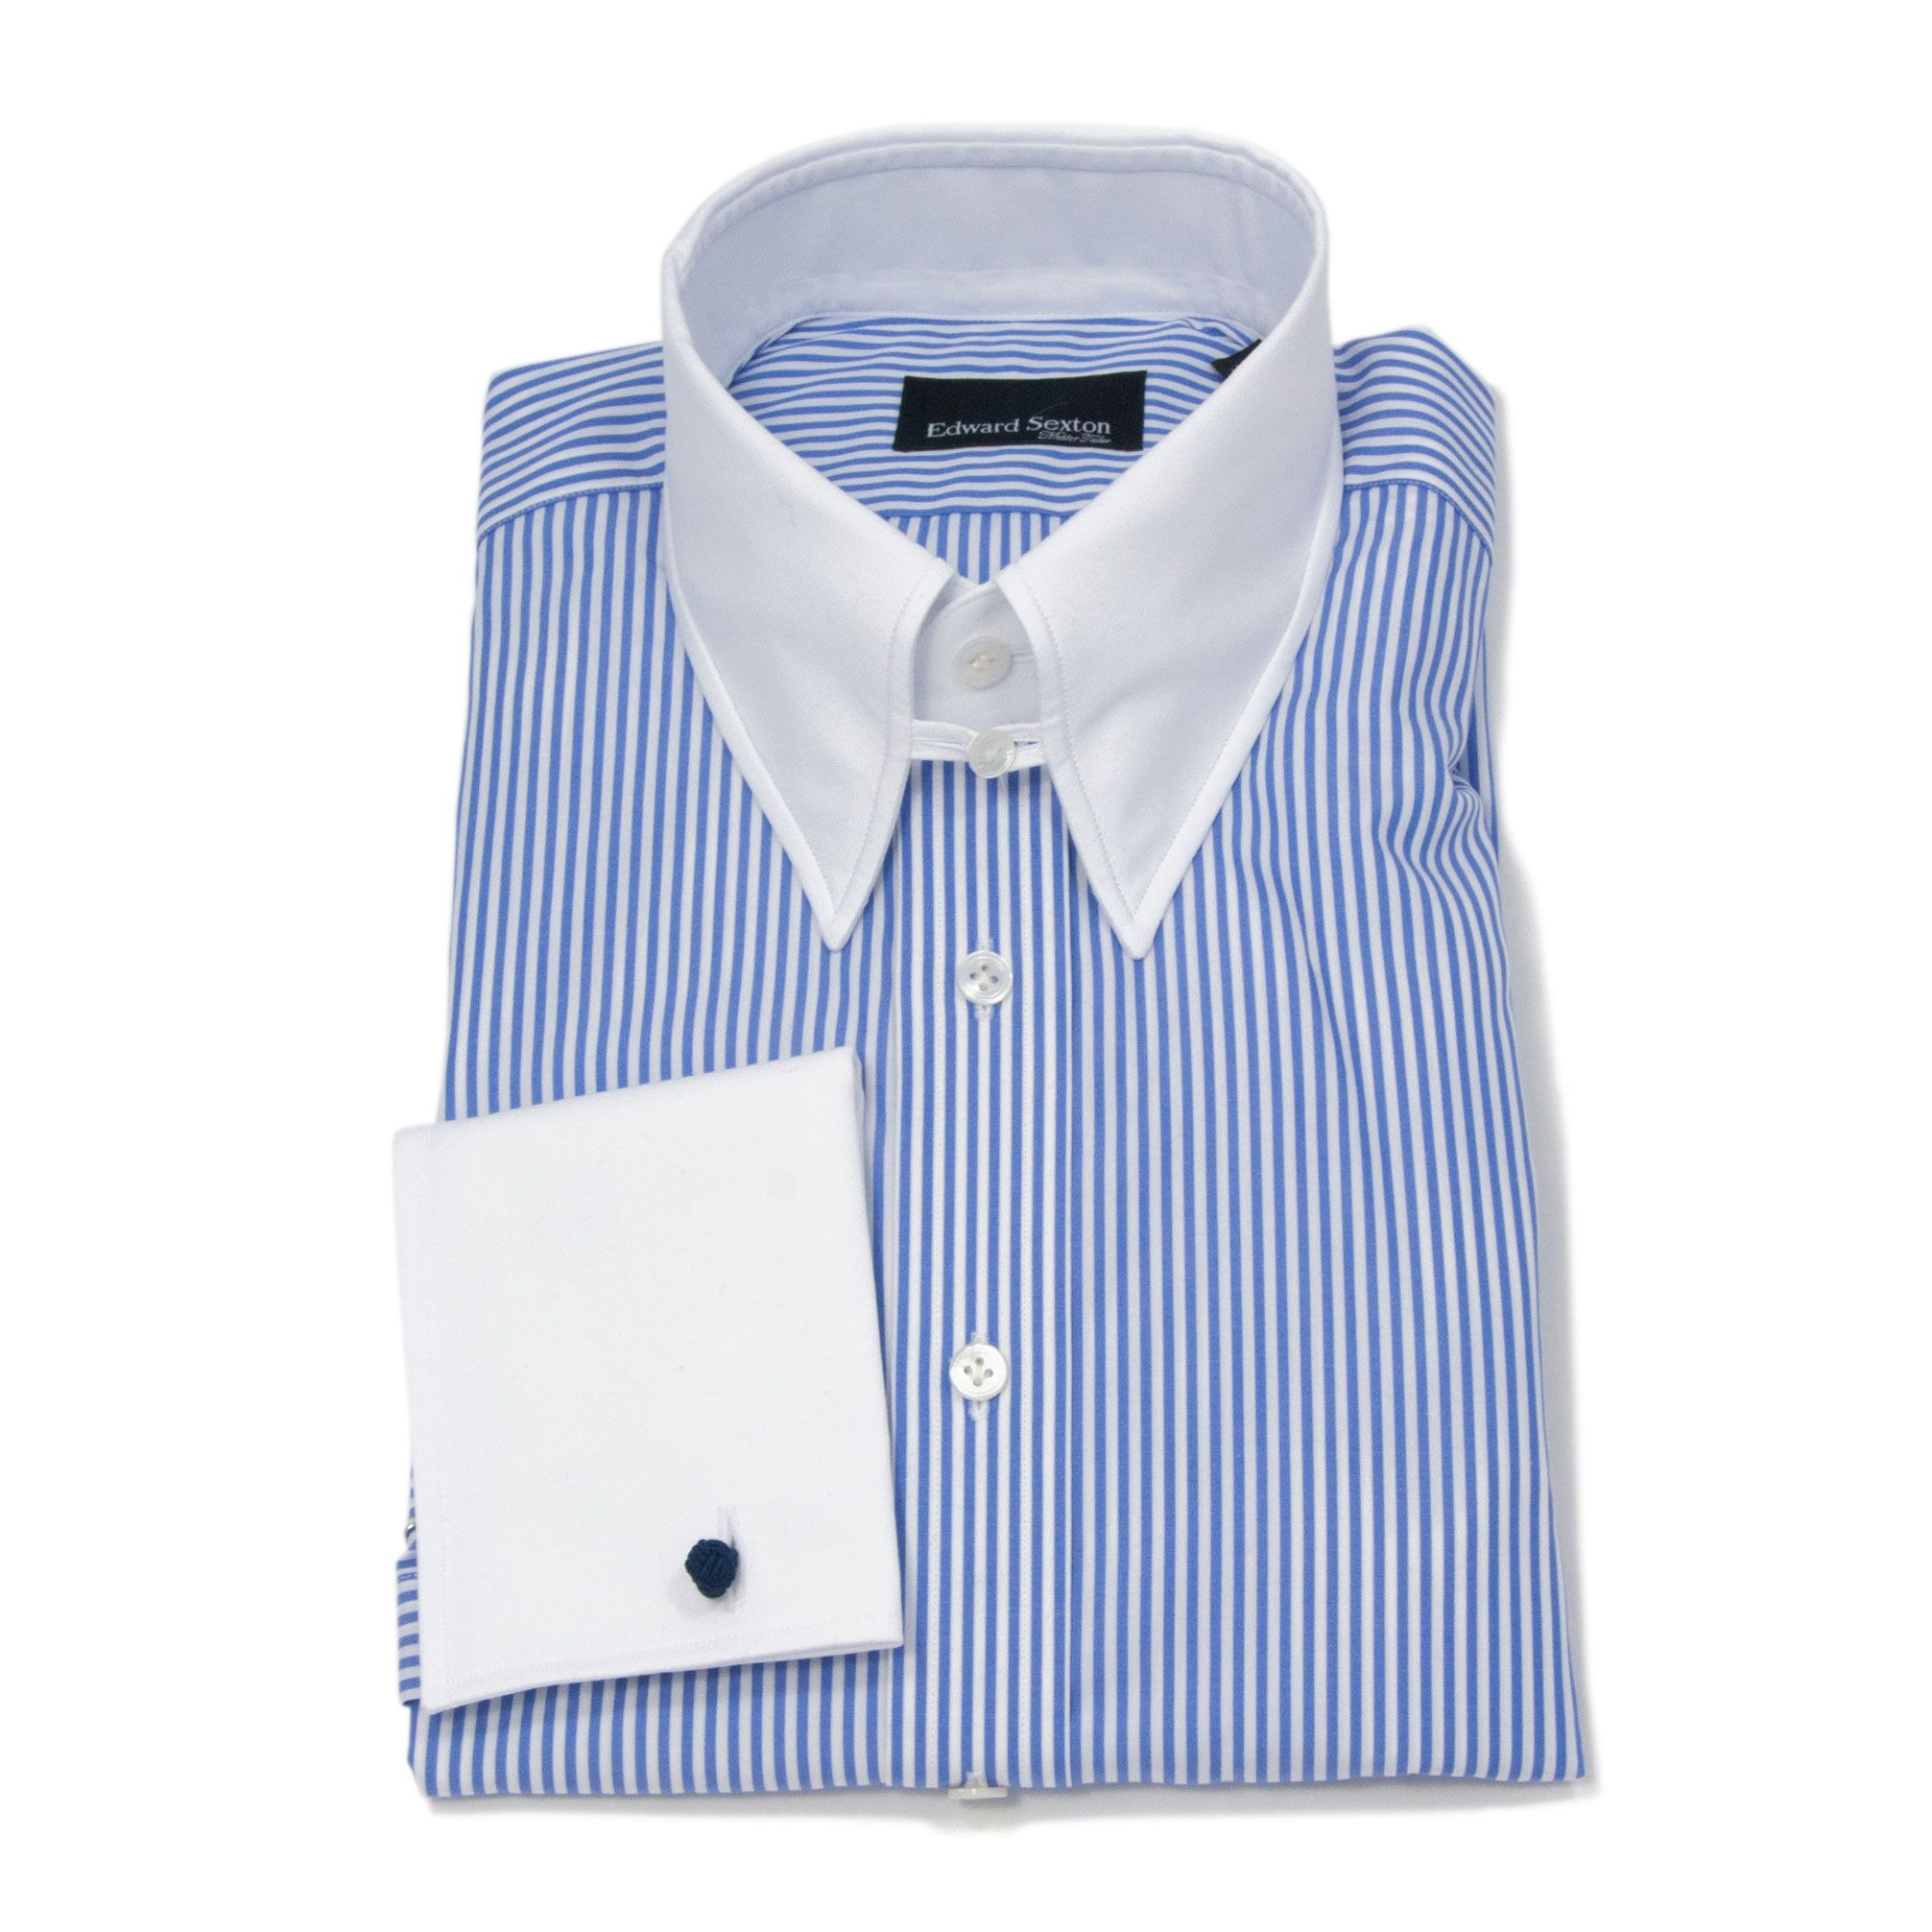 Edward Sexton Luxury Blue Bengal Stripe Slim Fit Tab Collar Shirt